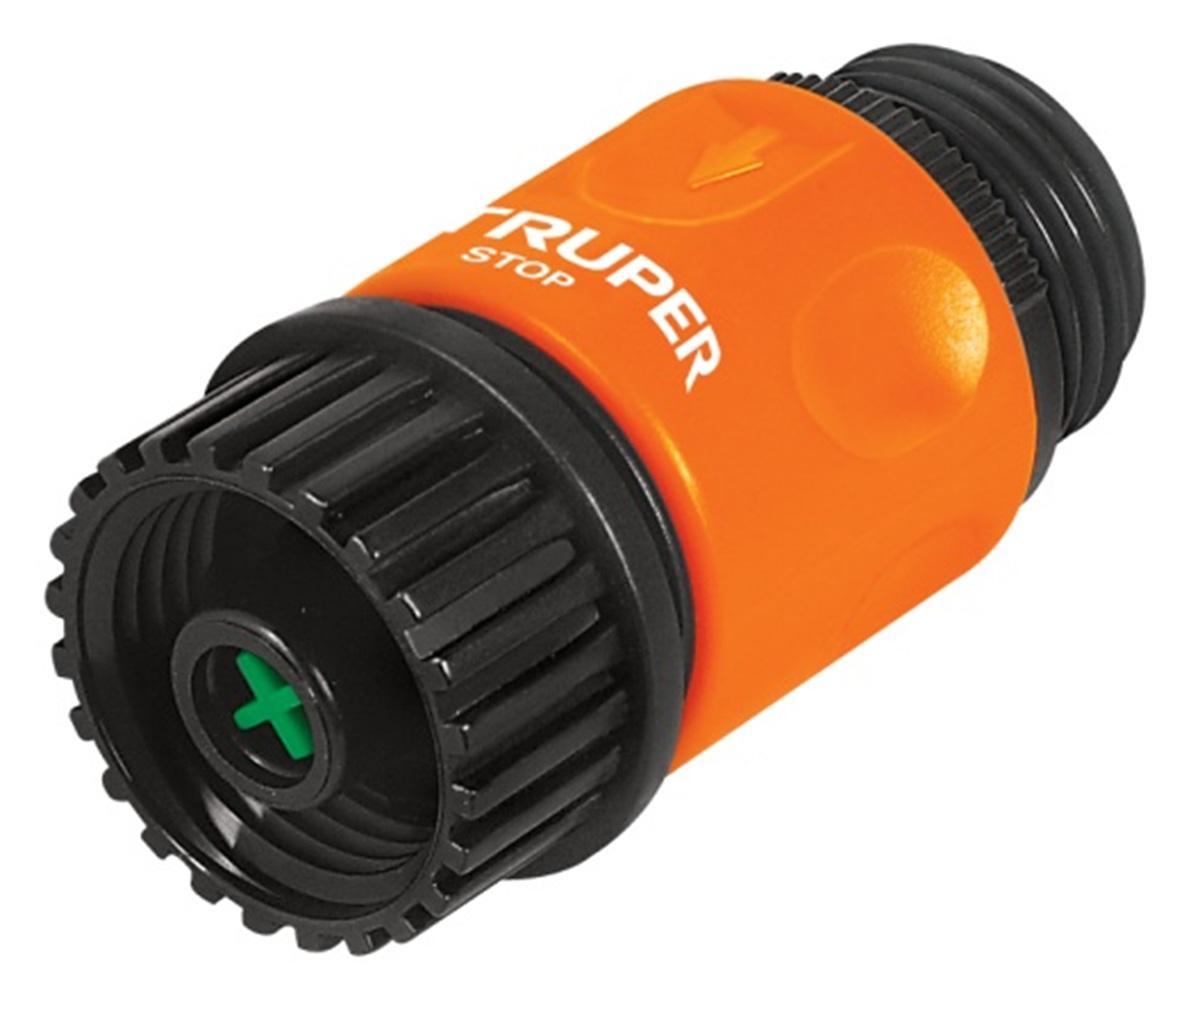 Коннектор для шланга Truper, быстрозащелкивающийся, аквастоп, 3/4 truper pcl e 31188